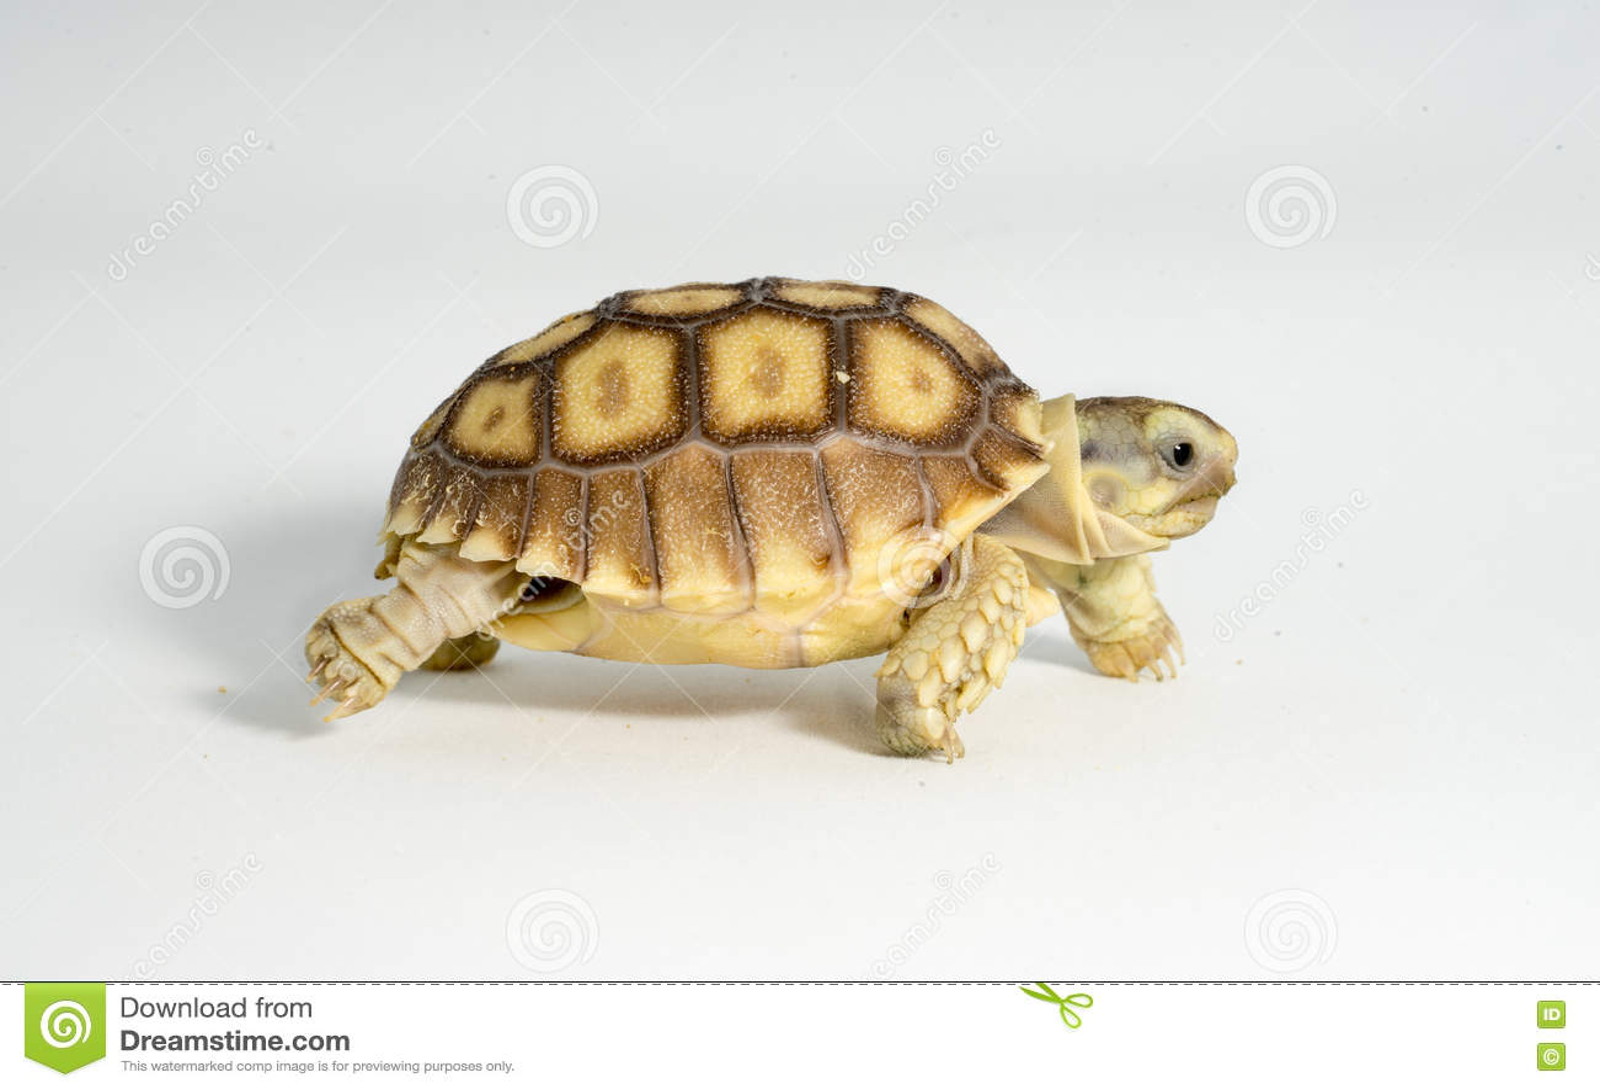 Turtle Newborn Sulcata Stock Image Image Of Ecology 76017263